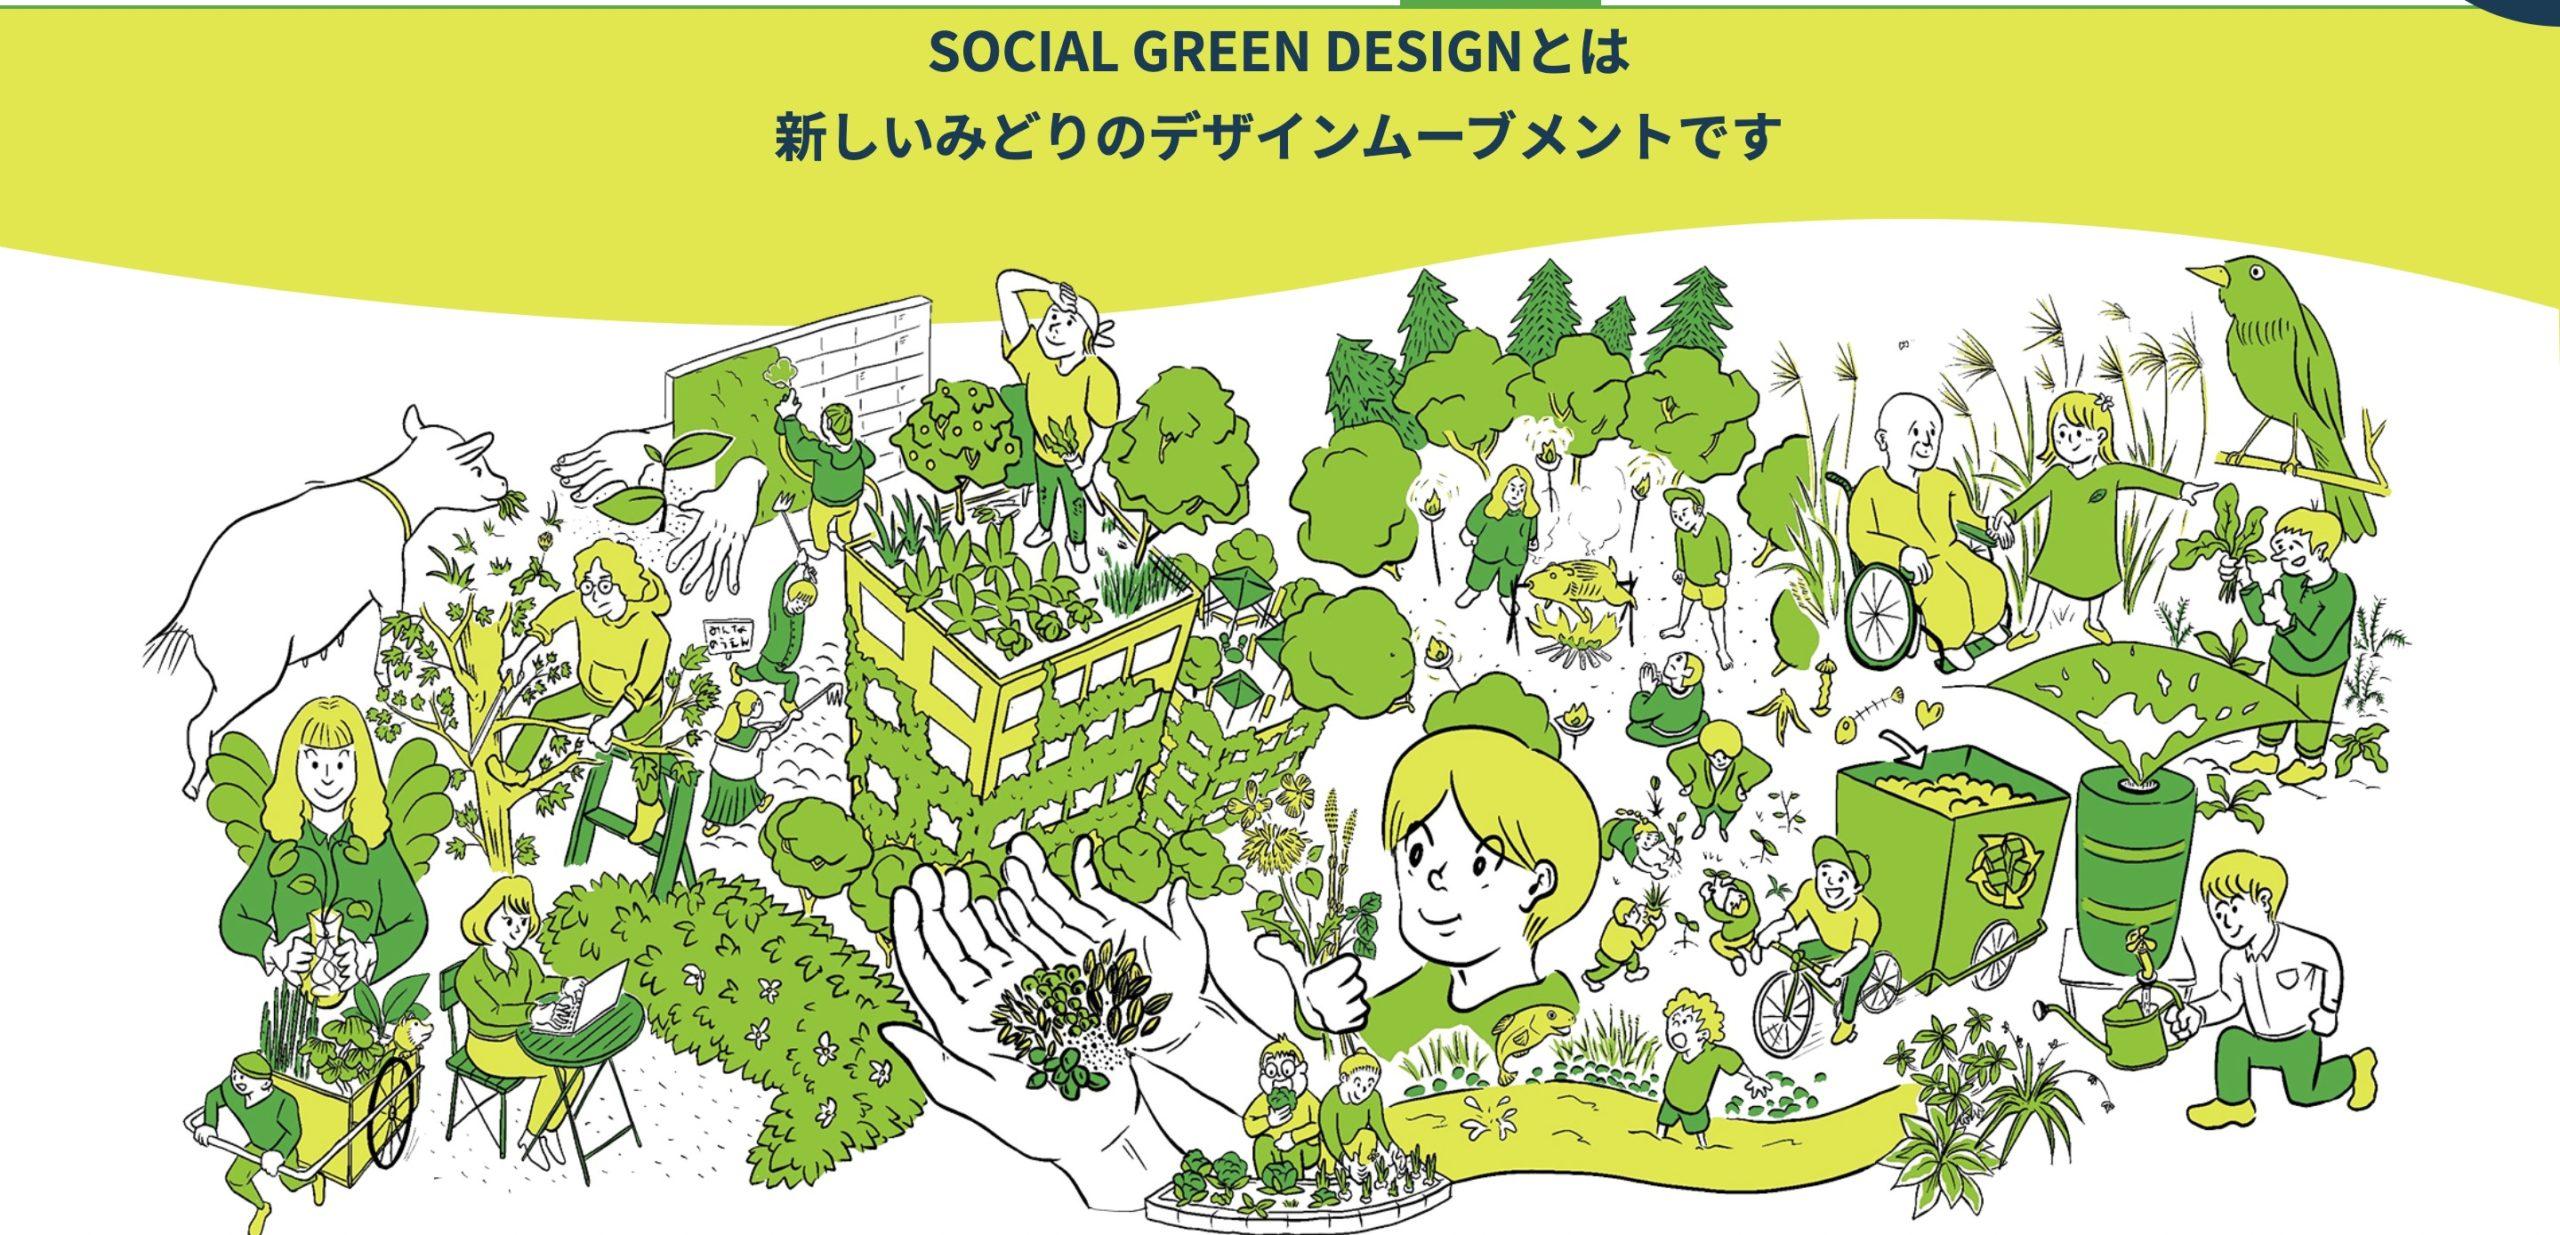 「SGD×コミュニティ」をテーマ―にSOCIAL GREEN DESIGN TALKの第2回を7月8日に配信/ソーシャルグリーンデザイン協会